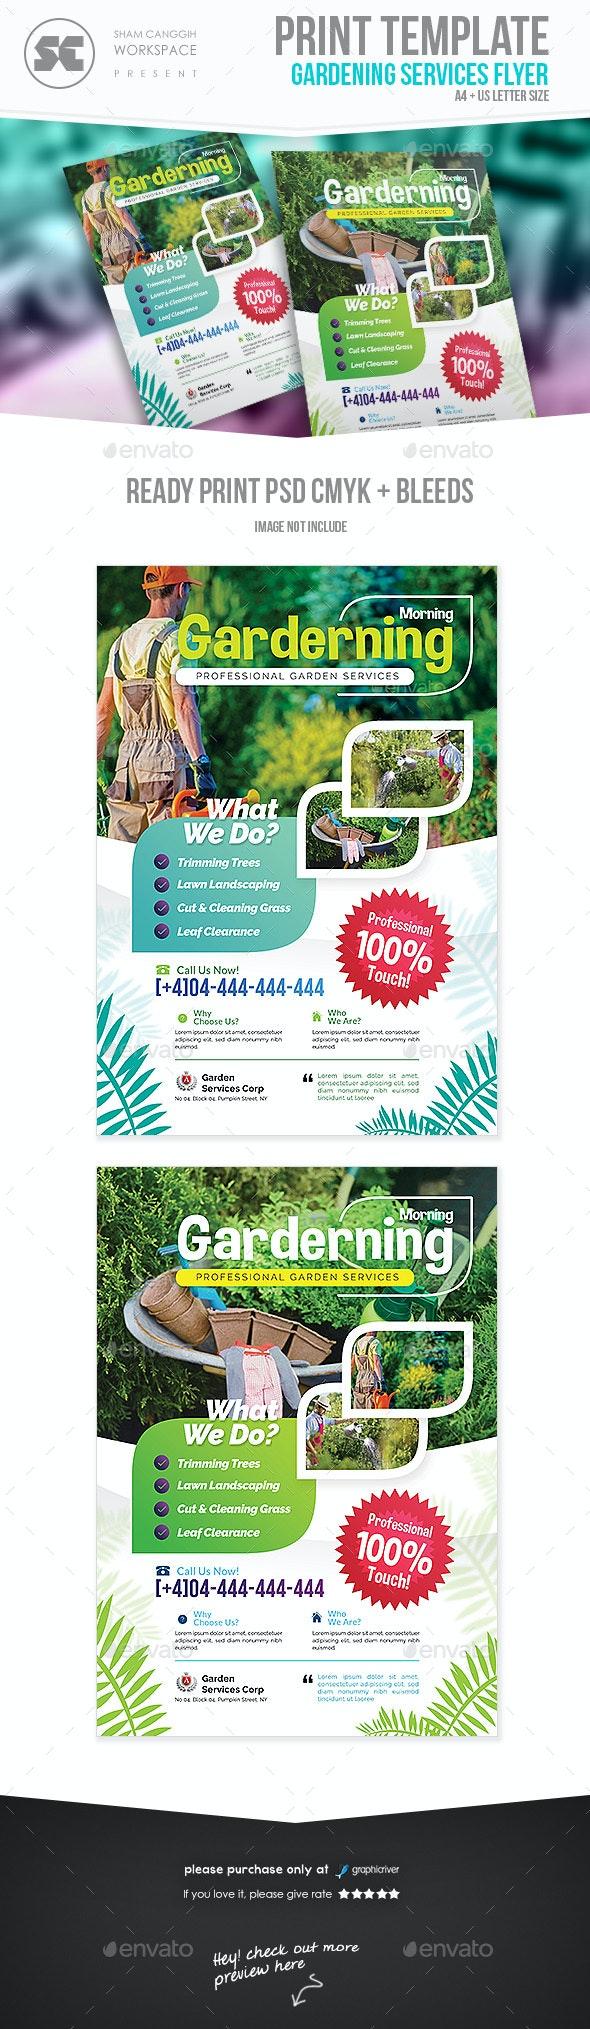 Garden Services Flyer - Commerce Flyers